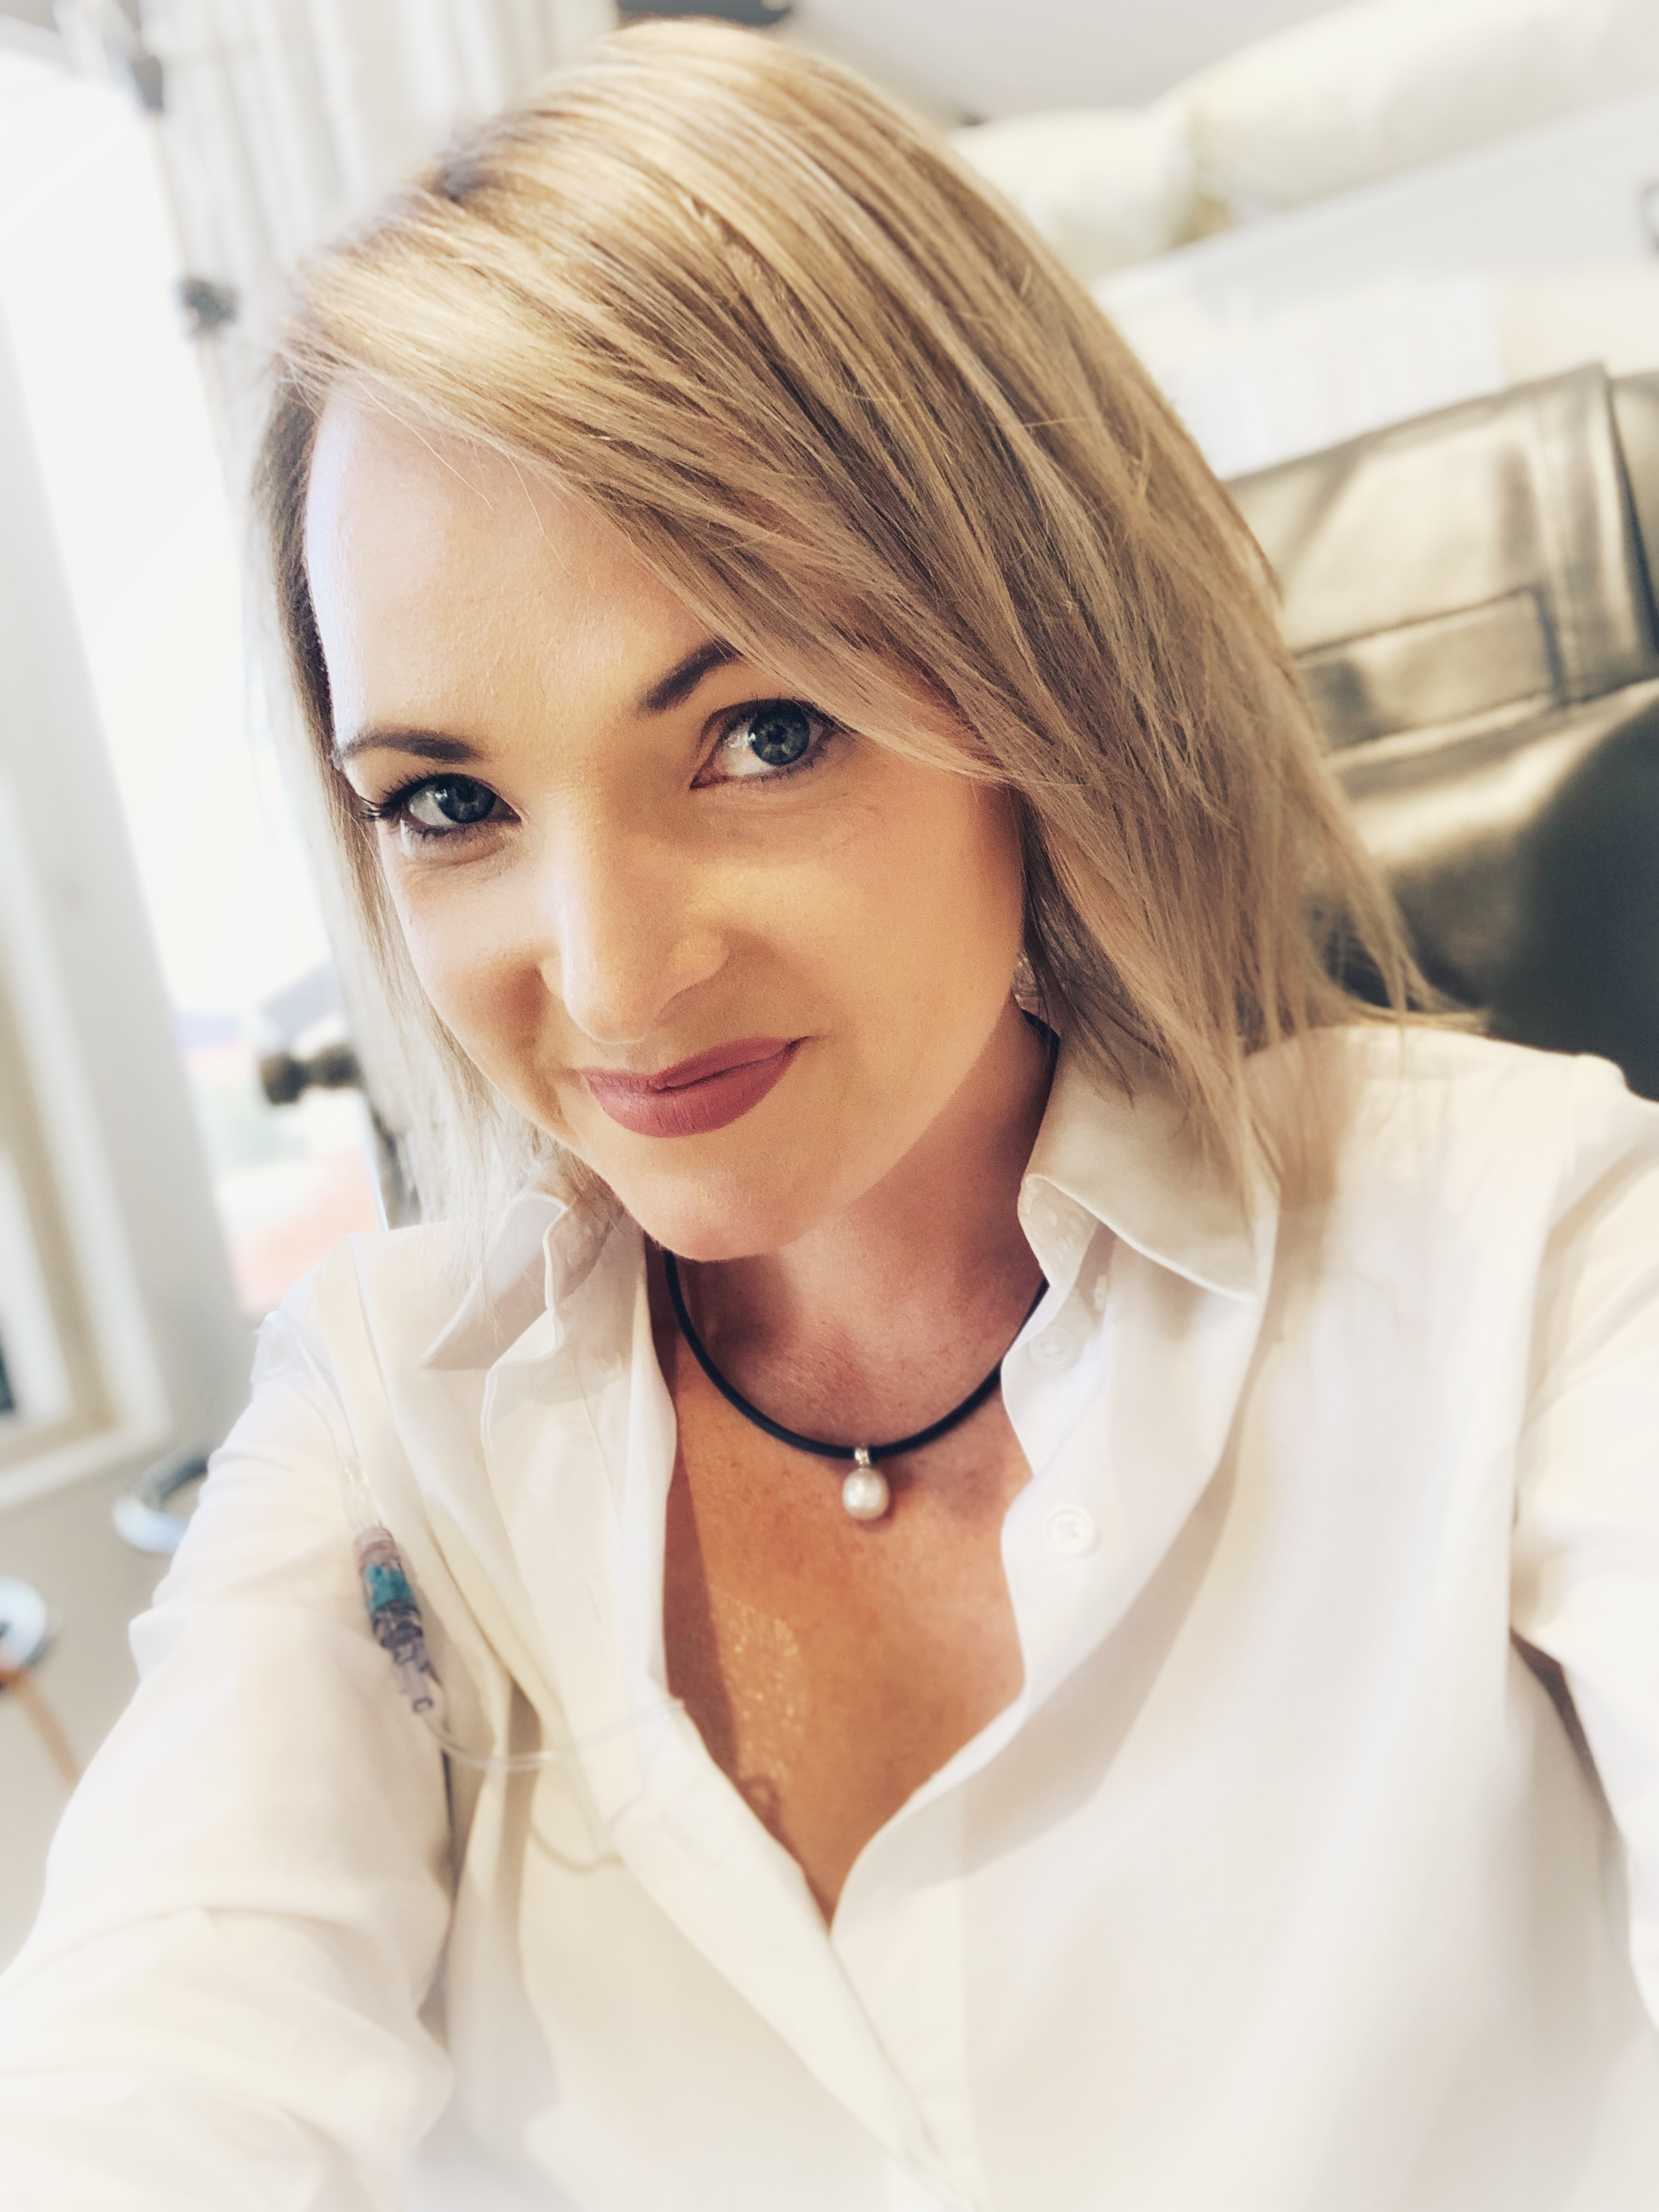 Nicole Cooper Practice Manager